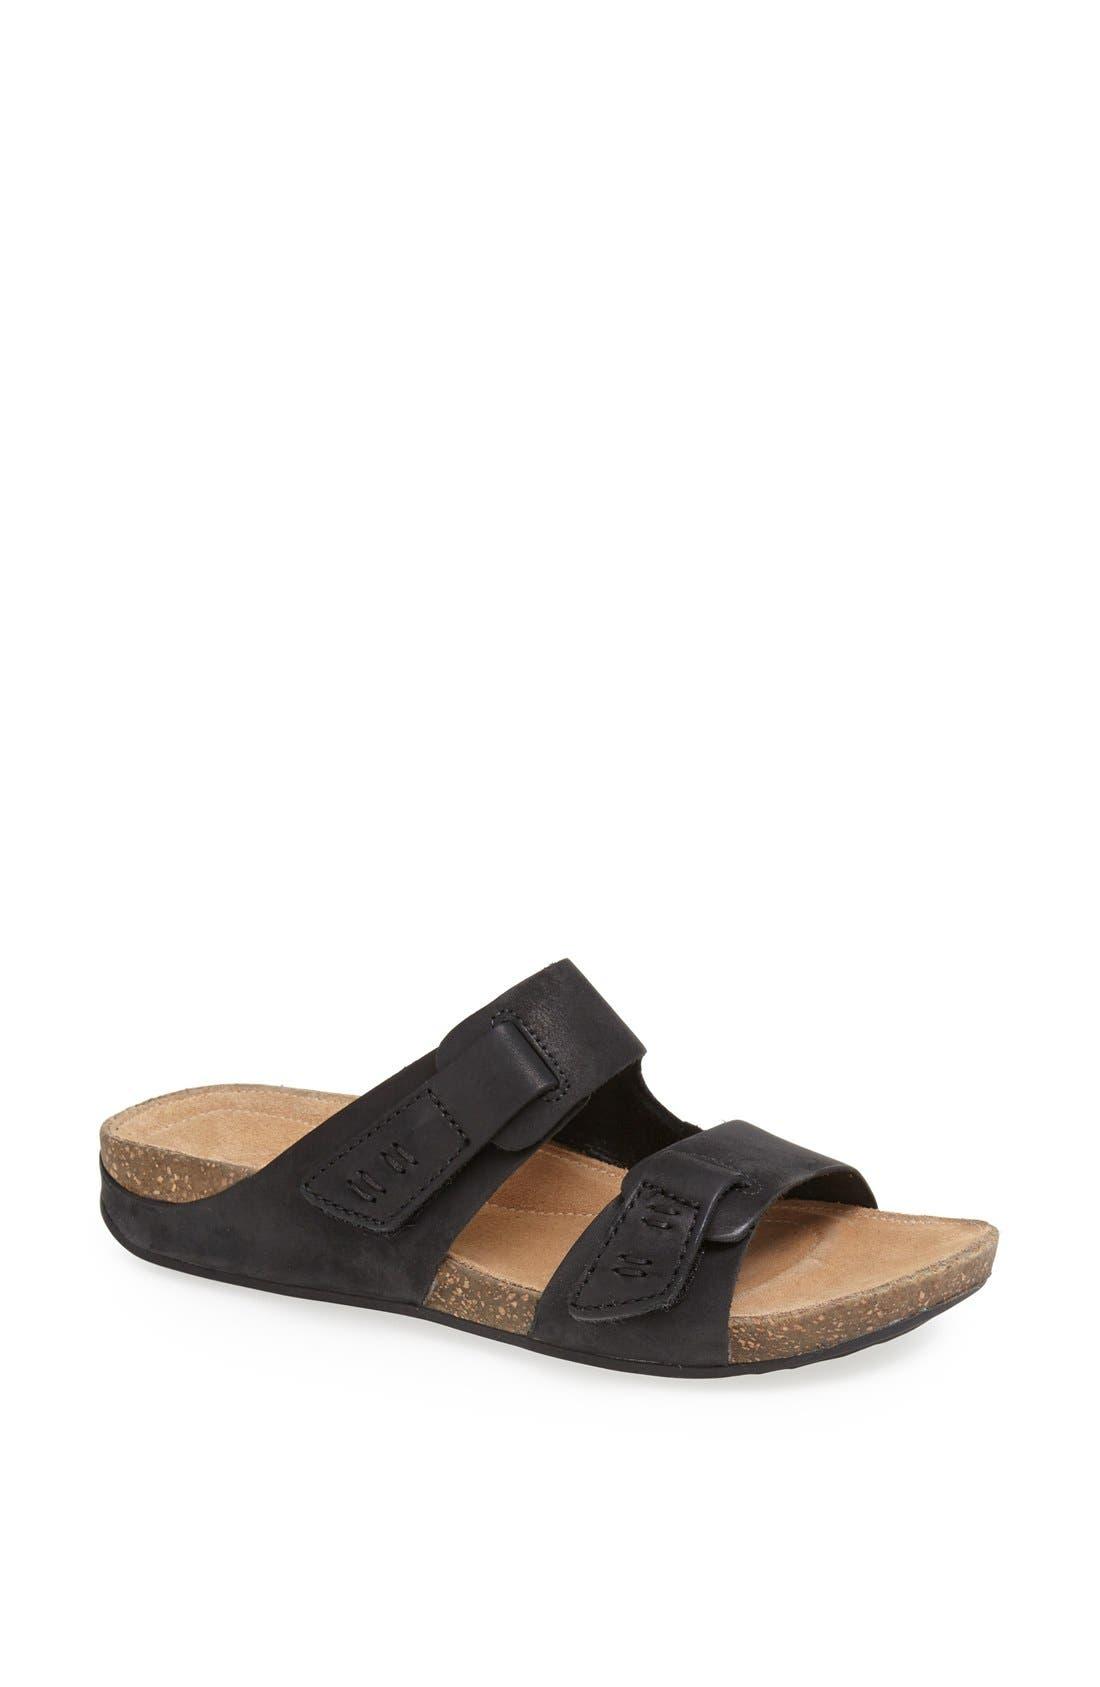 'Perri Coast' Leather Thong Sandal,                             Main thumbnail 1, color,                             005